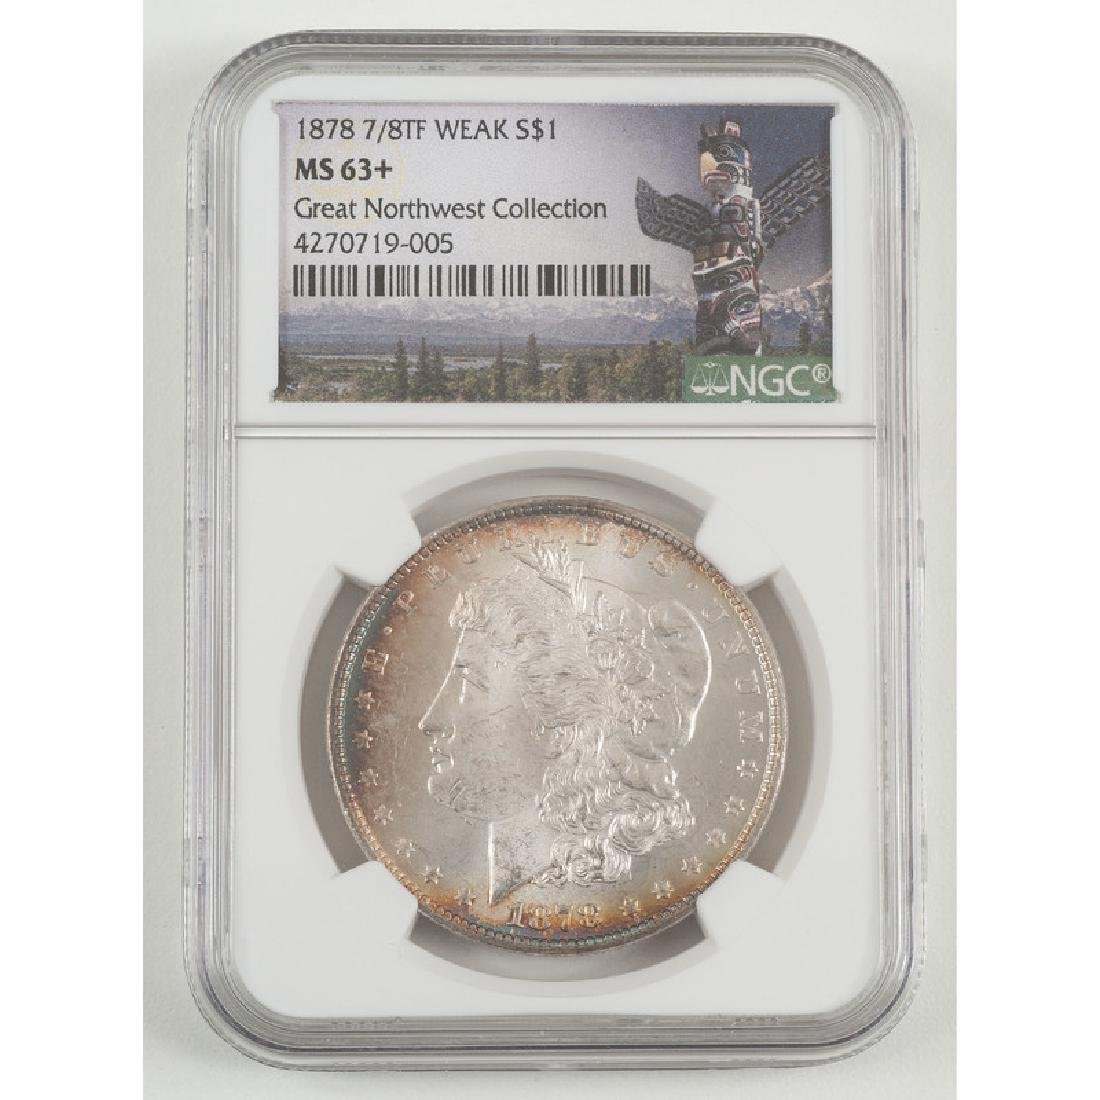 United States Morgan Silver Dollar 1878 7/8TF, NGC MS63